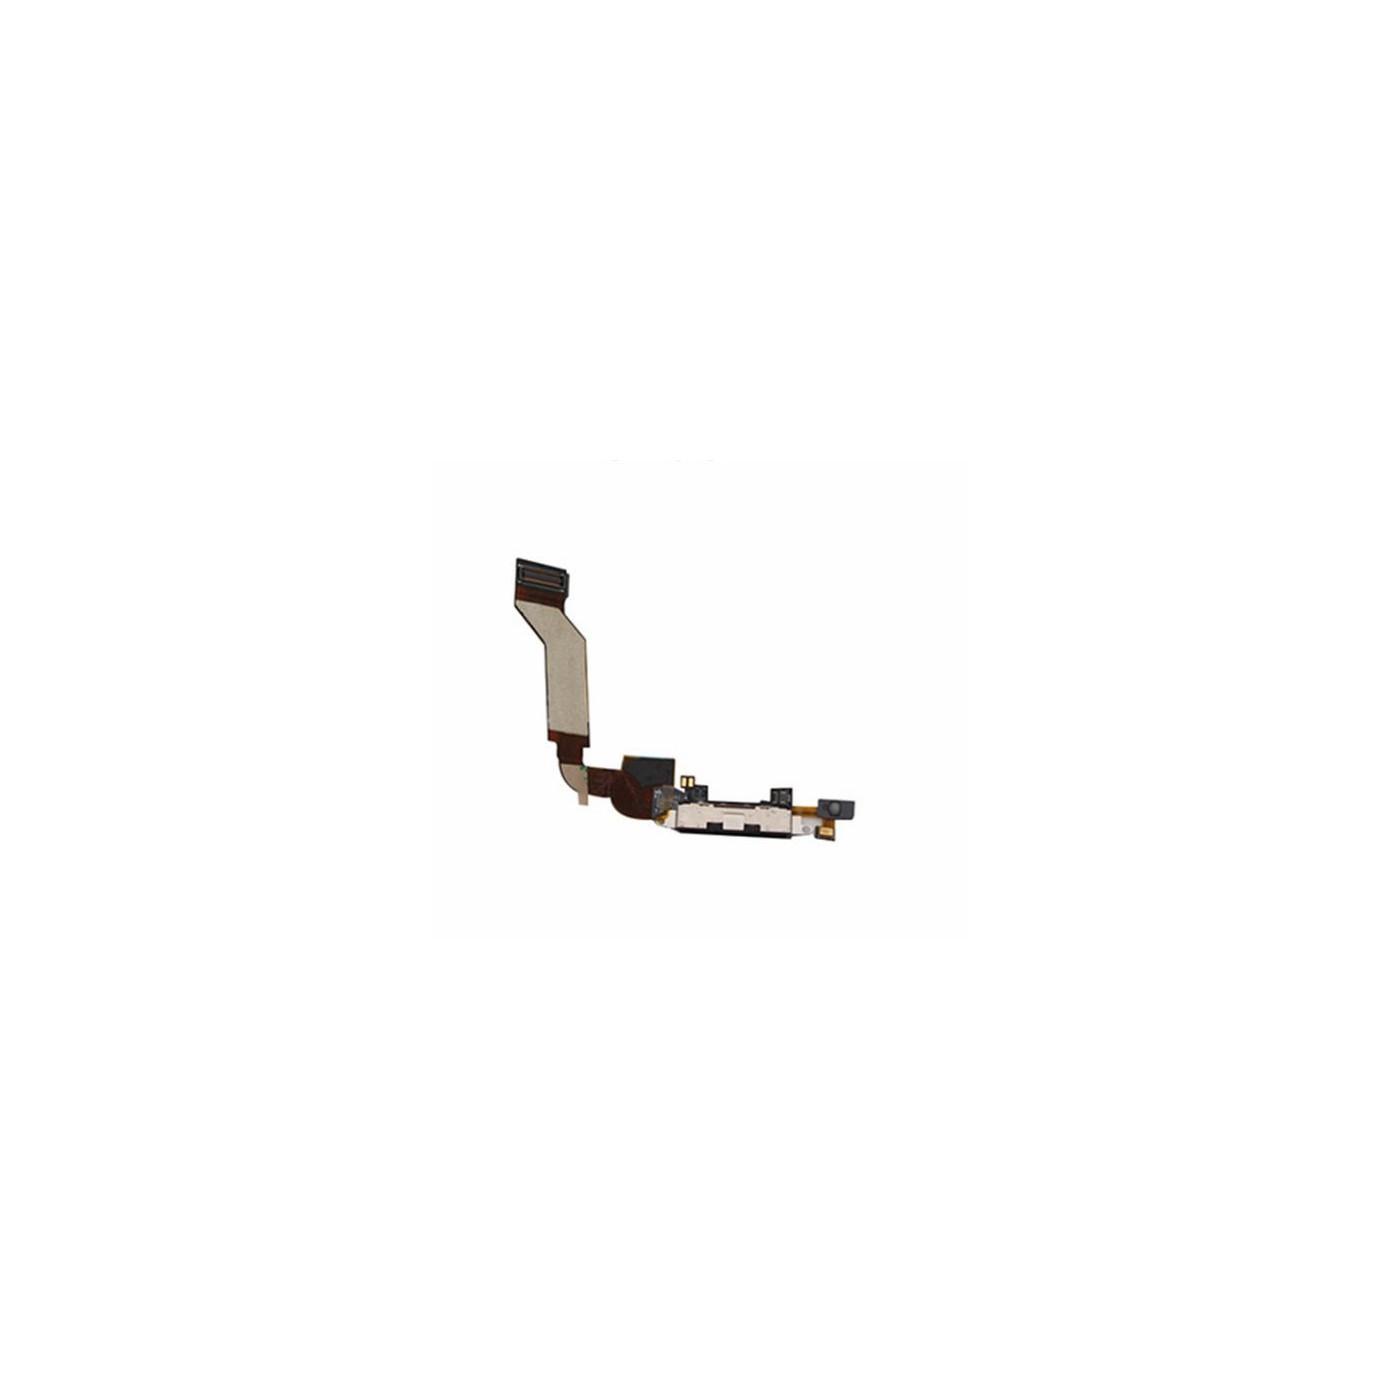 Conector de carga dock apple iphone 4s negro micrófono altavoz flex